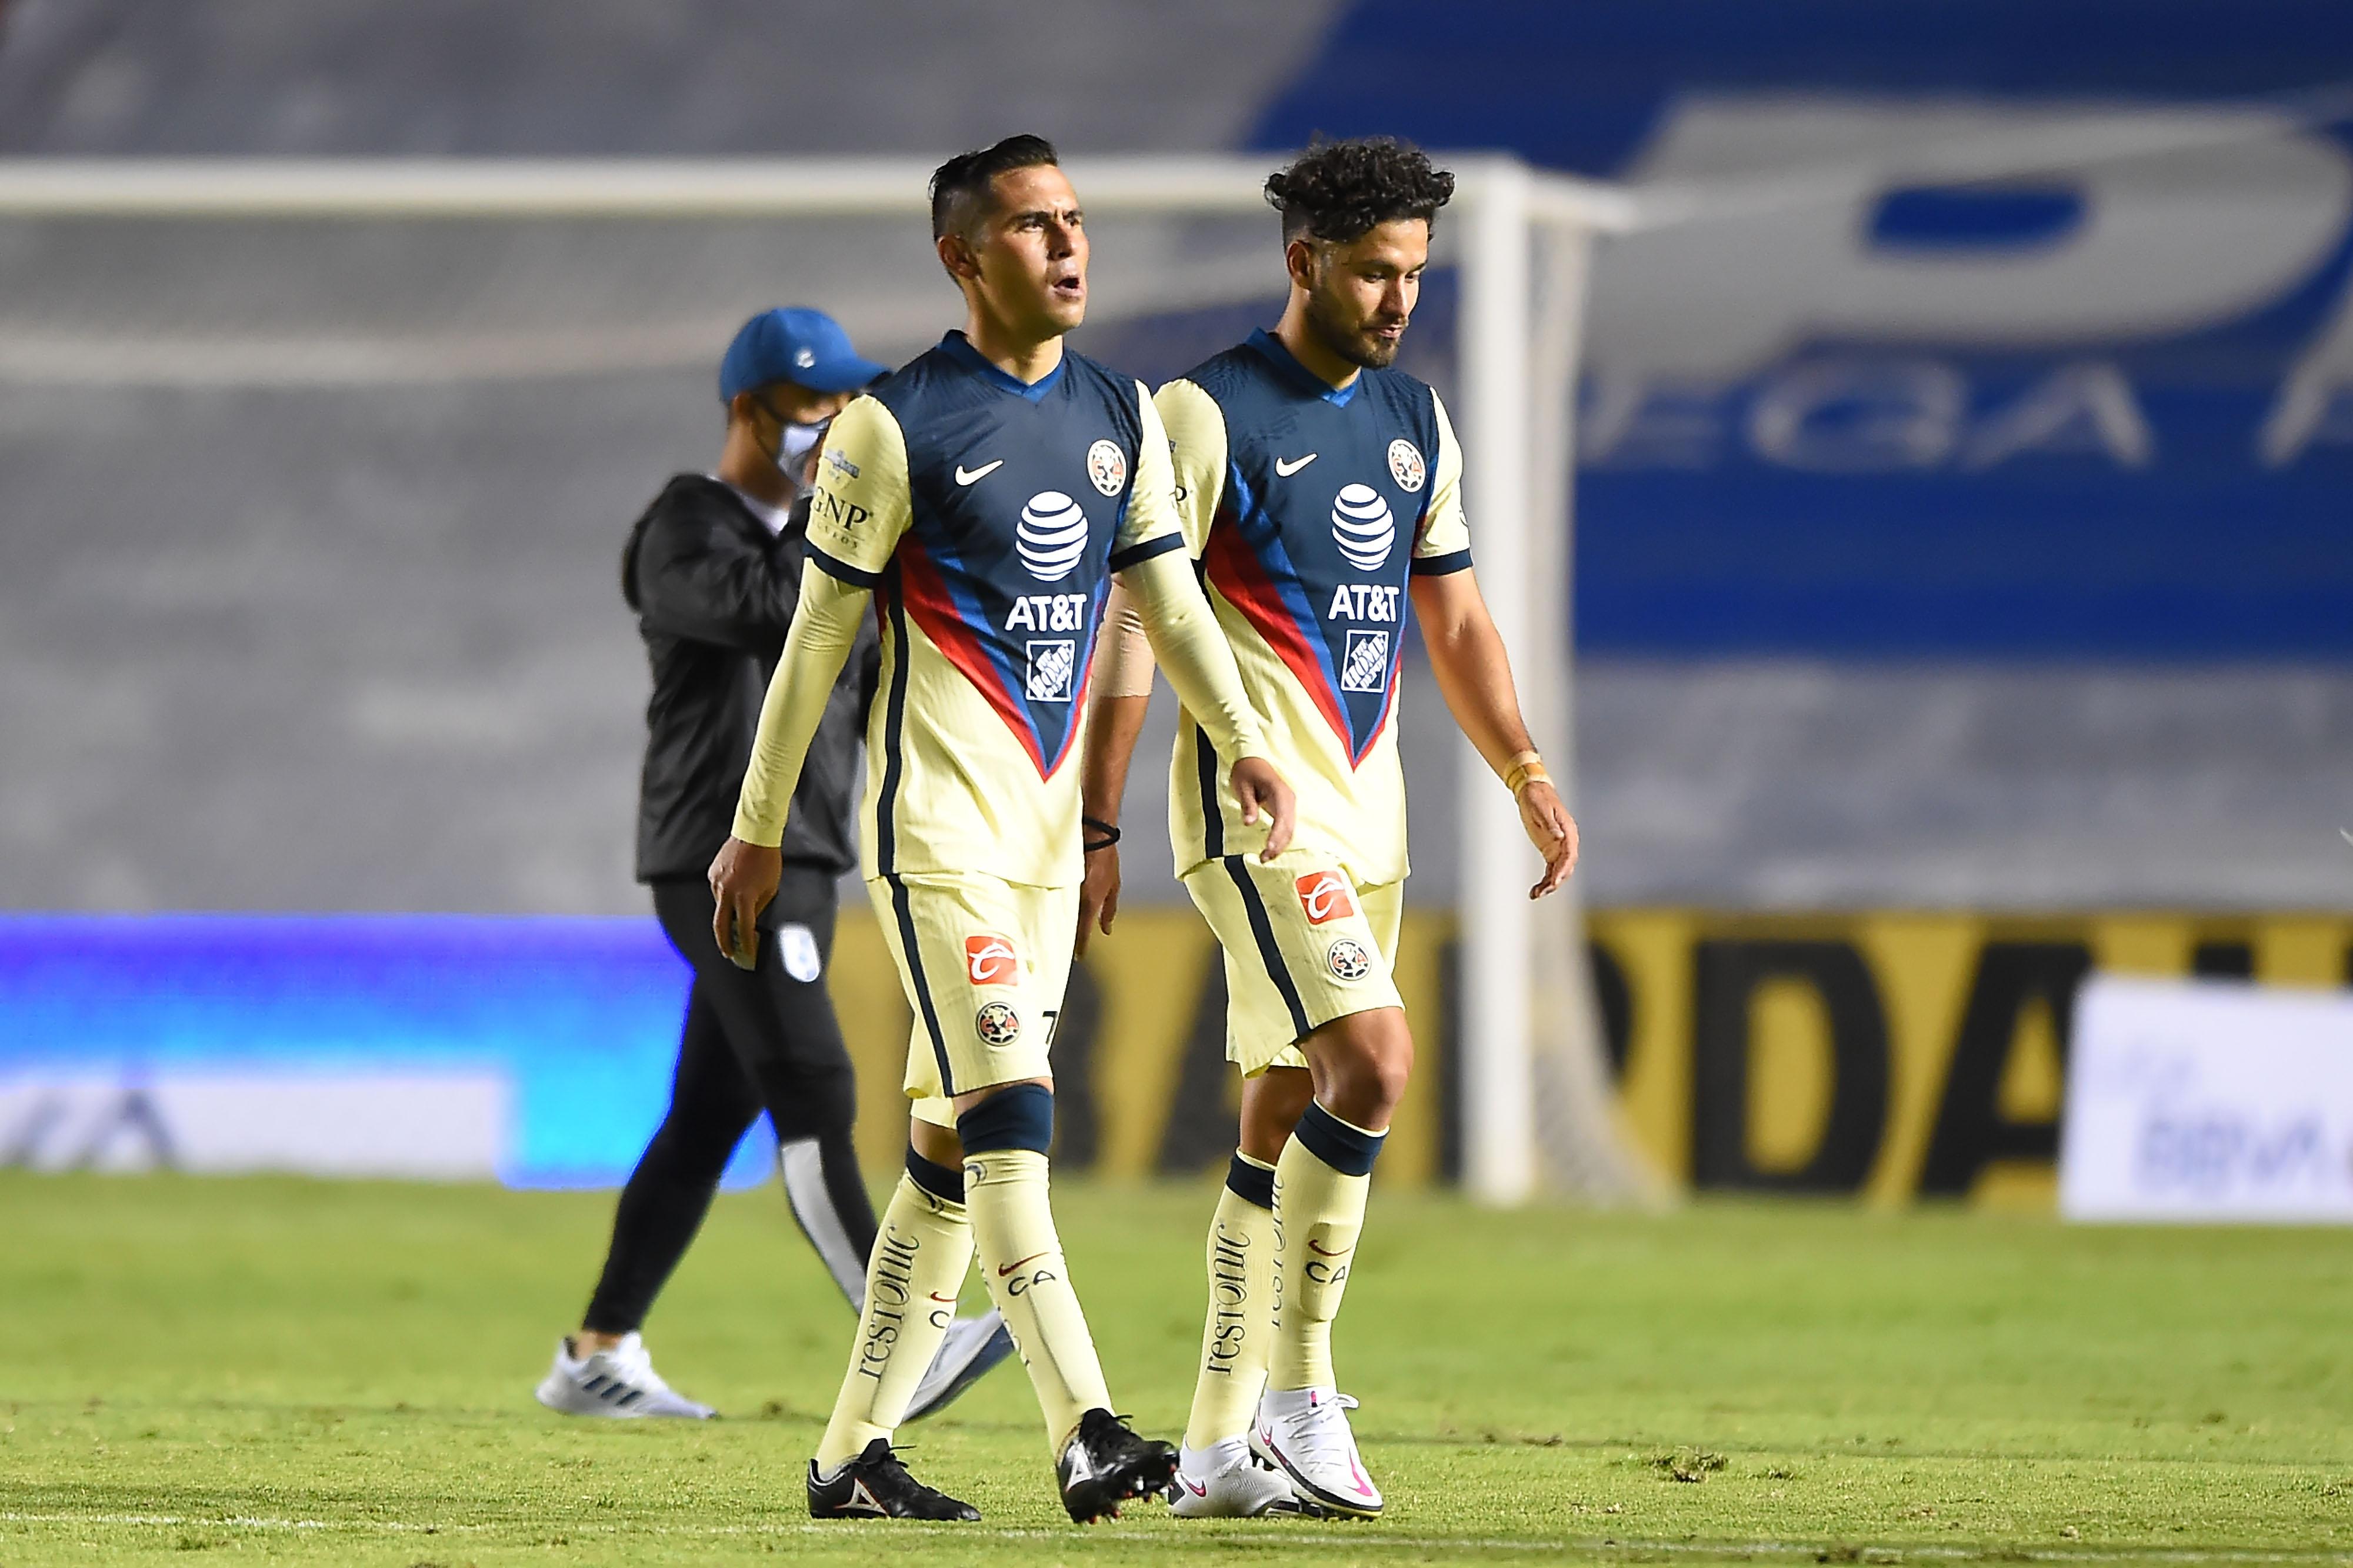 Querétaro demostró que ganarle a Cruz Azul no es imposible — Memo Vázquez